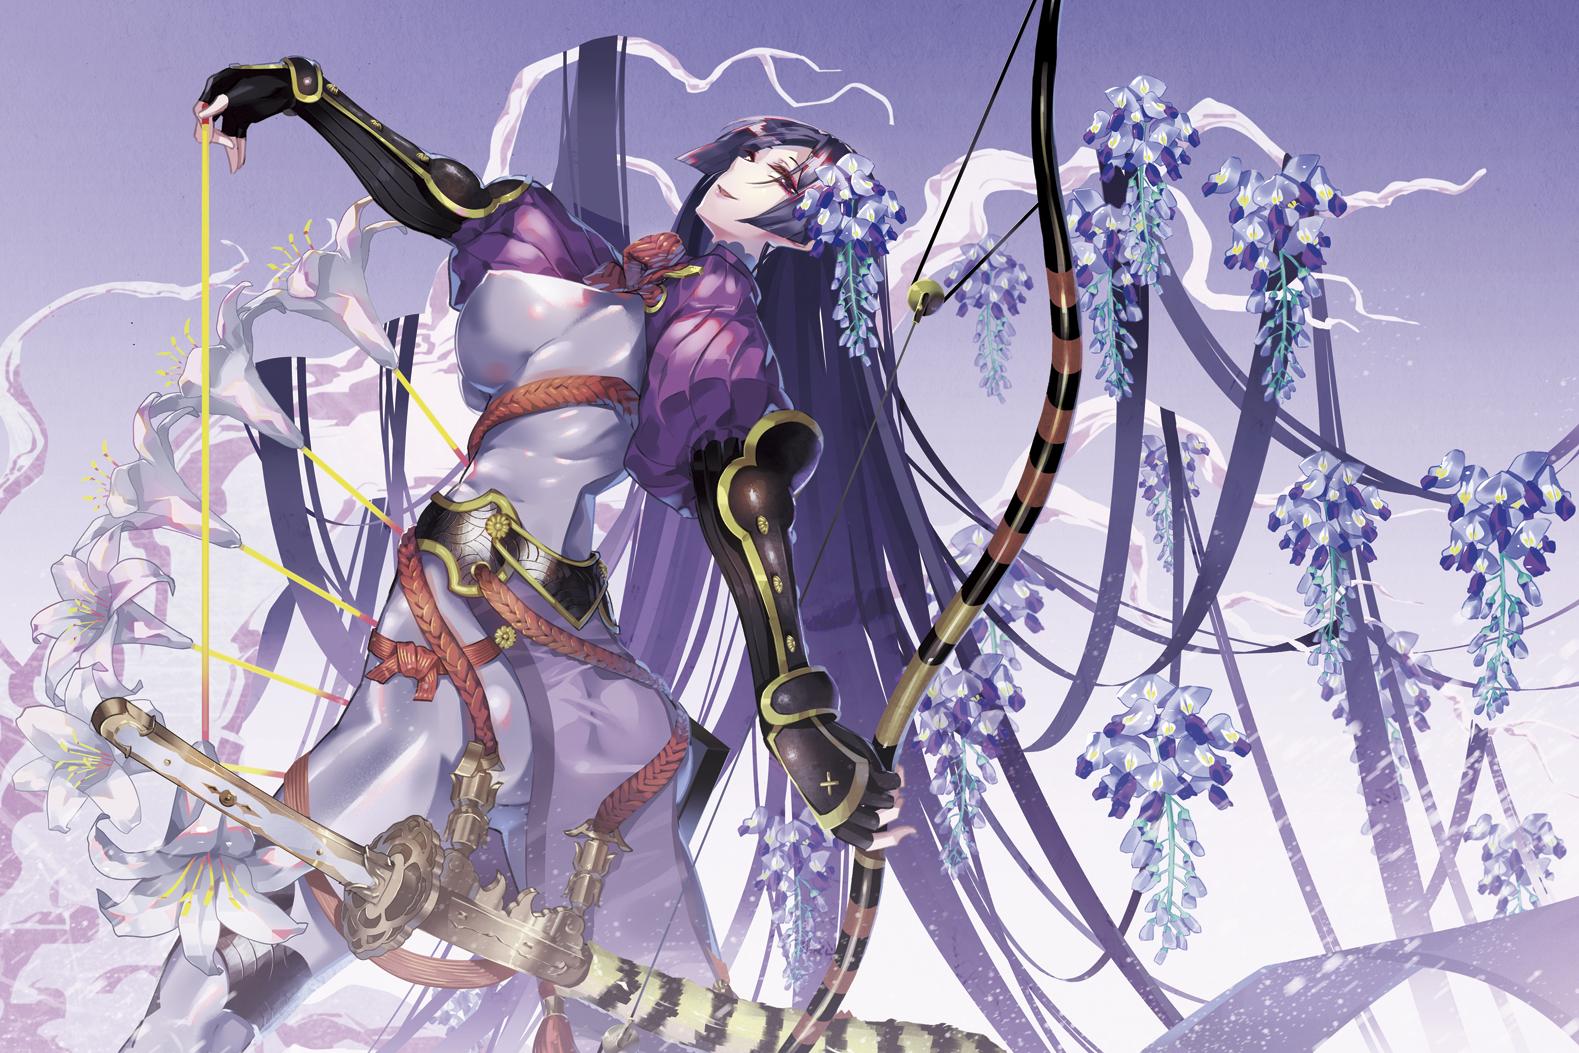 Gilr with purple hair with big boobs Wallpaper Anime Girls Fate Grand Order Minamoto No Yorimitsu Fate Purple Hair Sword Katana Long Hair Bow Ass Big Boobs 1579x1053 Actargon 1526397 Hd Wallpapers Wallhere